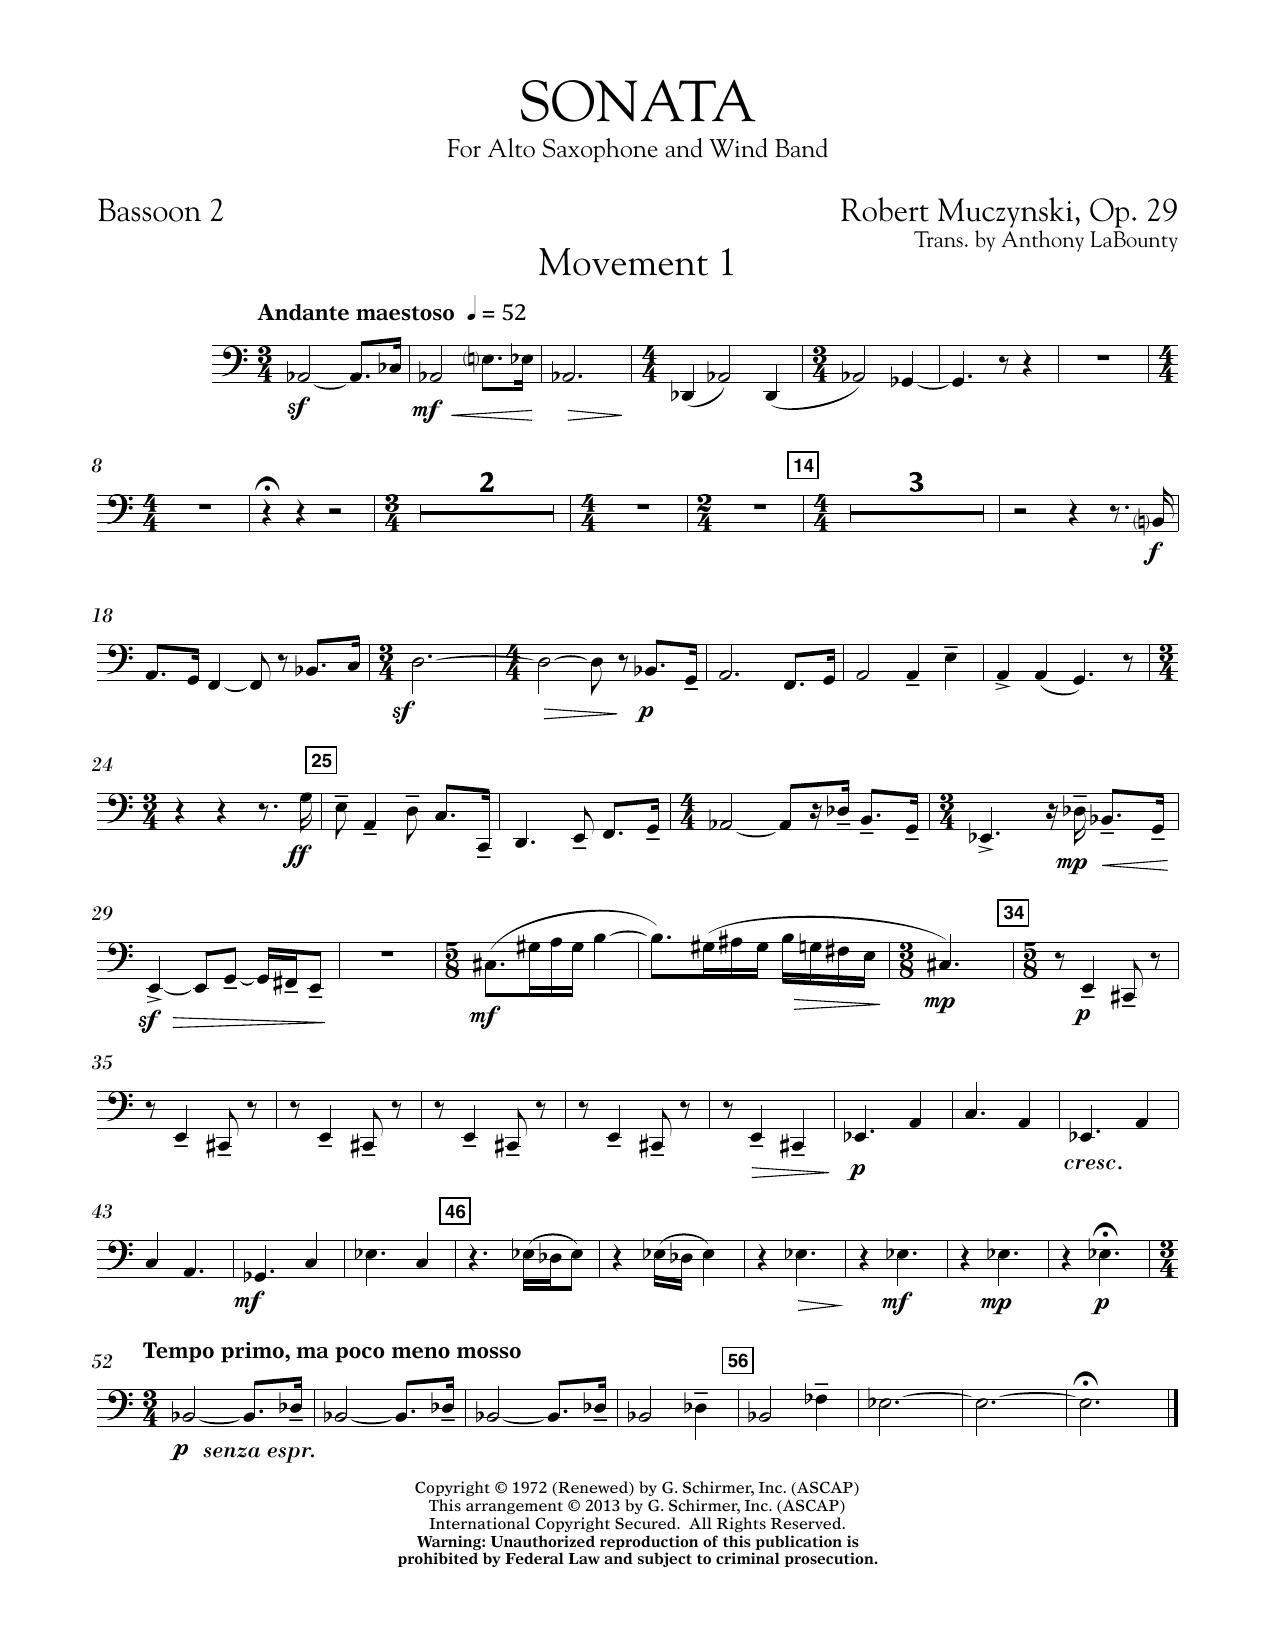 Sonata for Alto Saxophone, Op. 29 - Bassoon 2 (Concert Band)